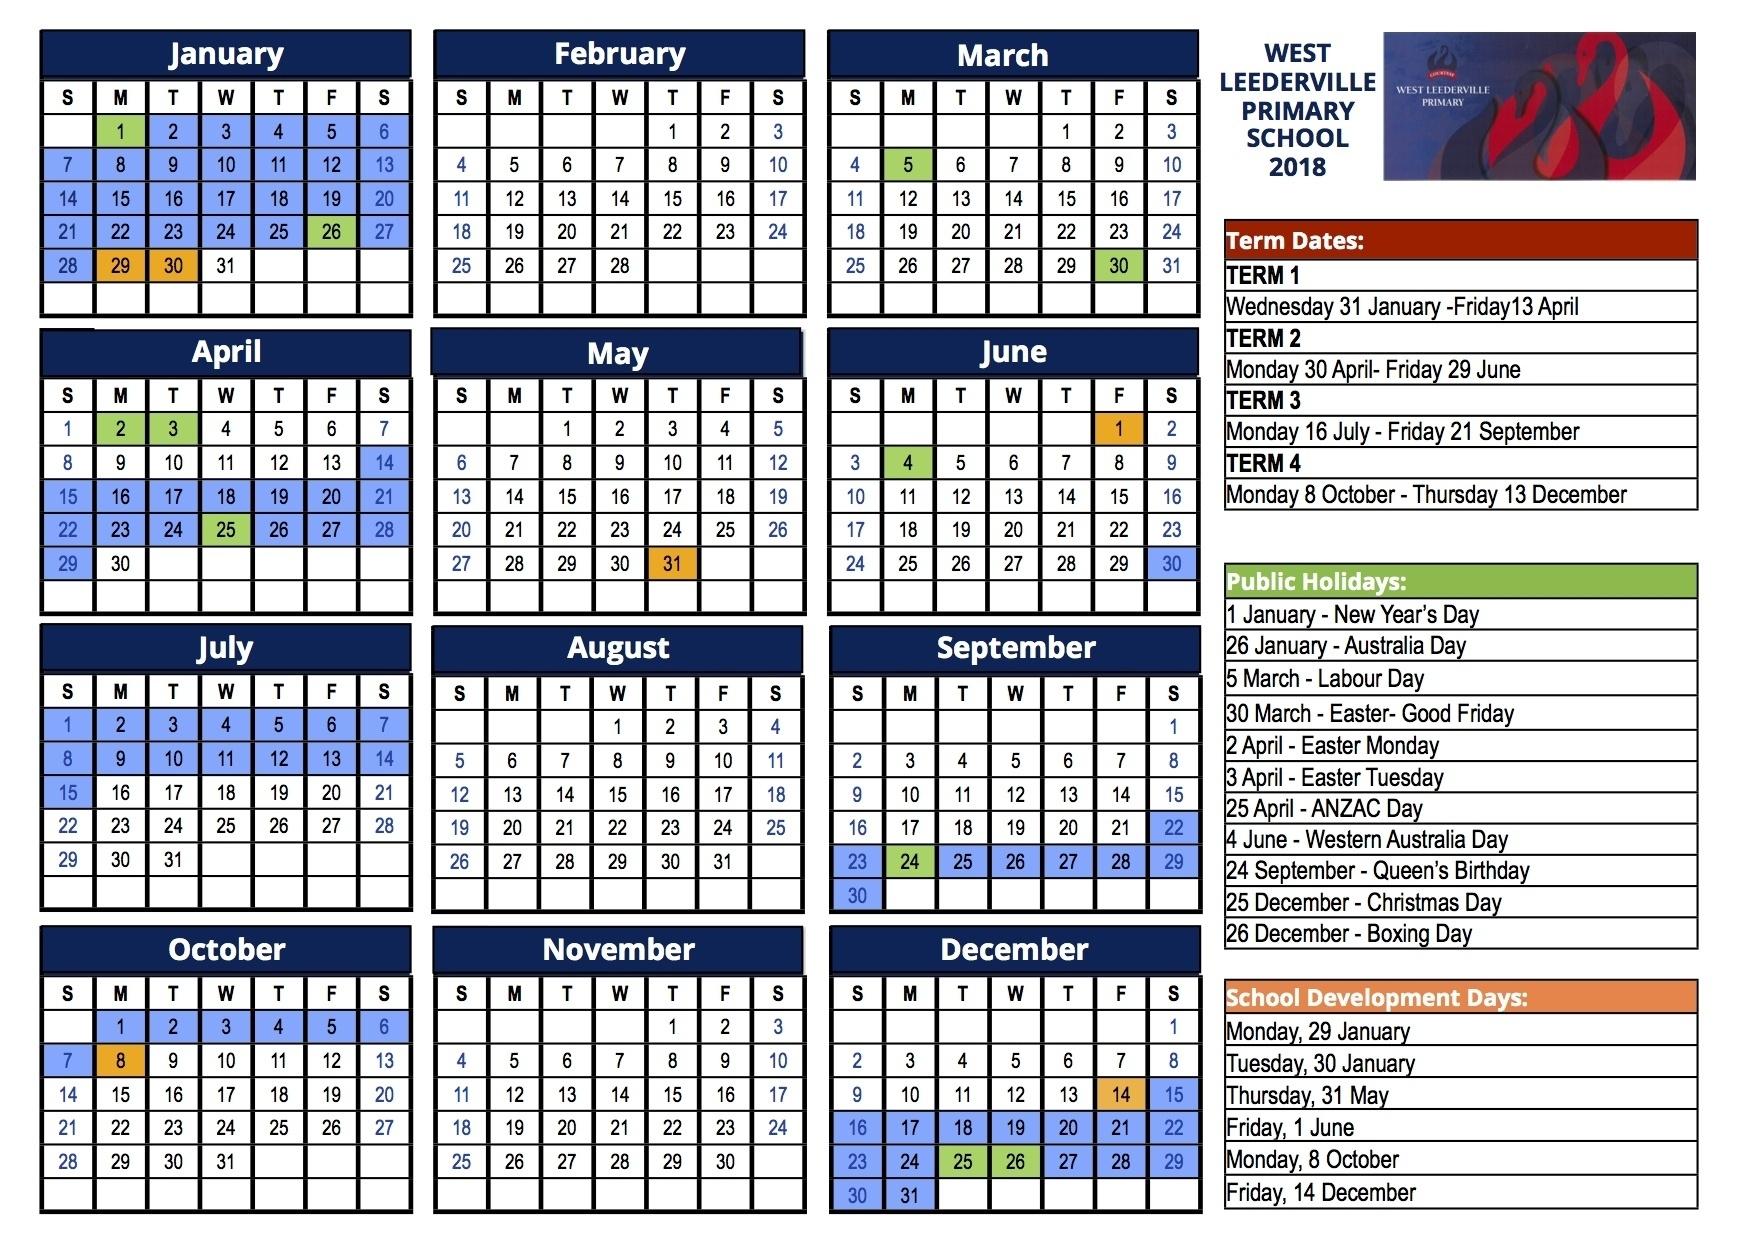 Exceptional Term 4 School Calendar • Printable Blank Calendar Template_Term 4 School Calendar